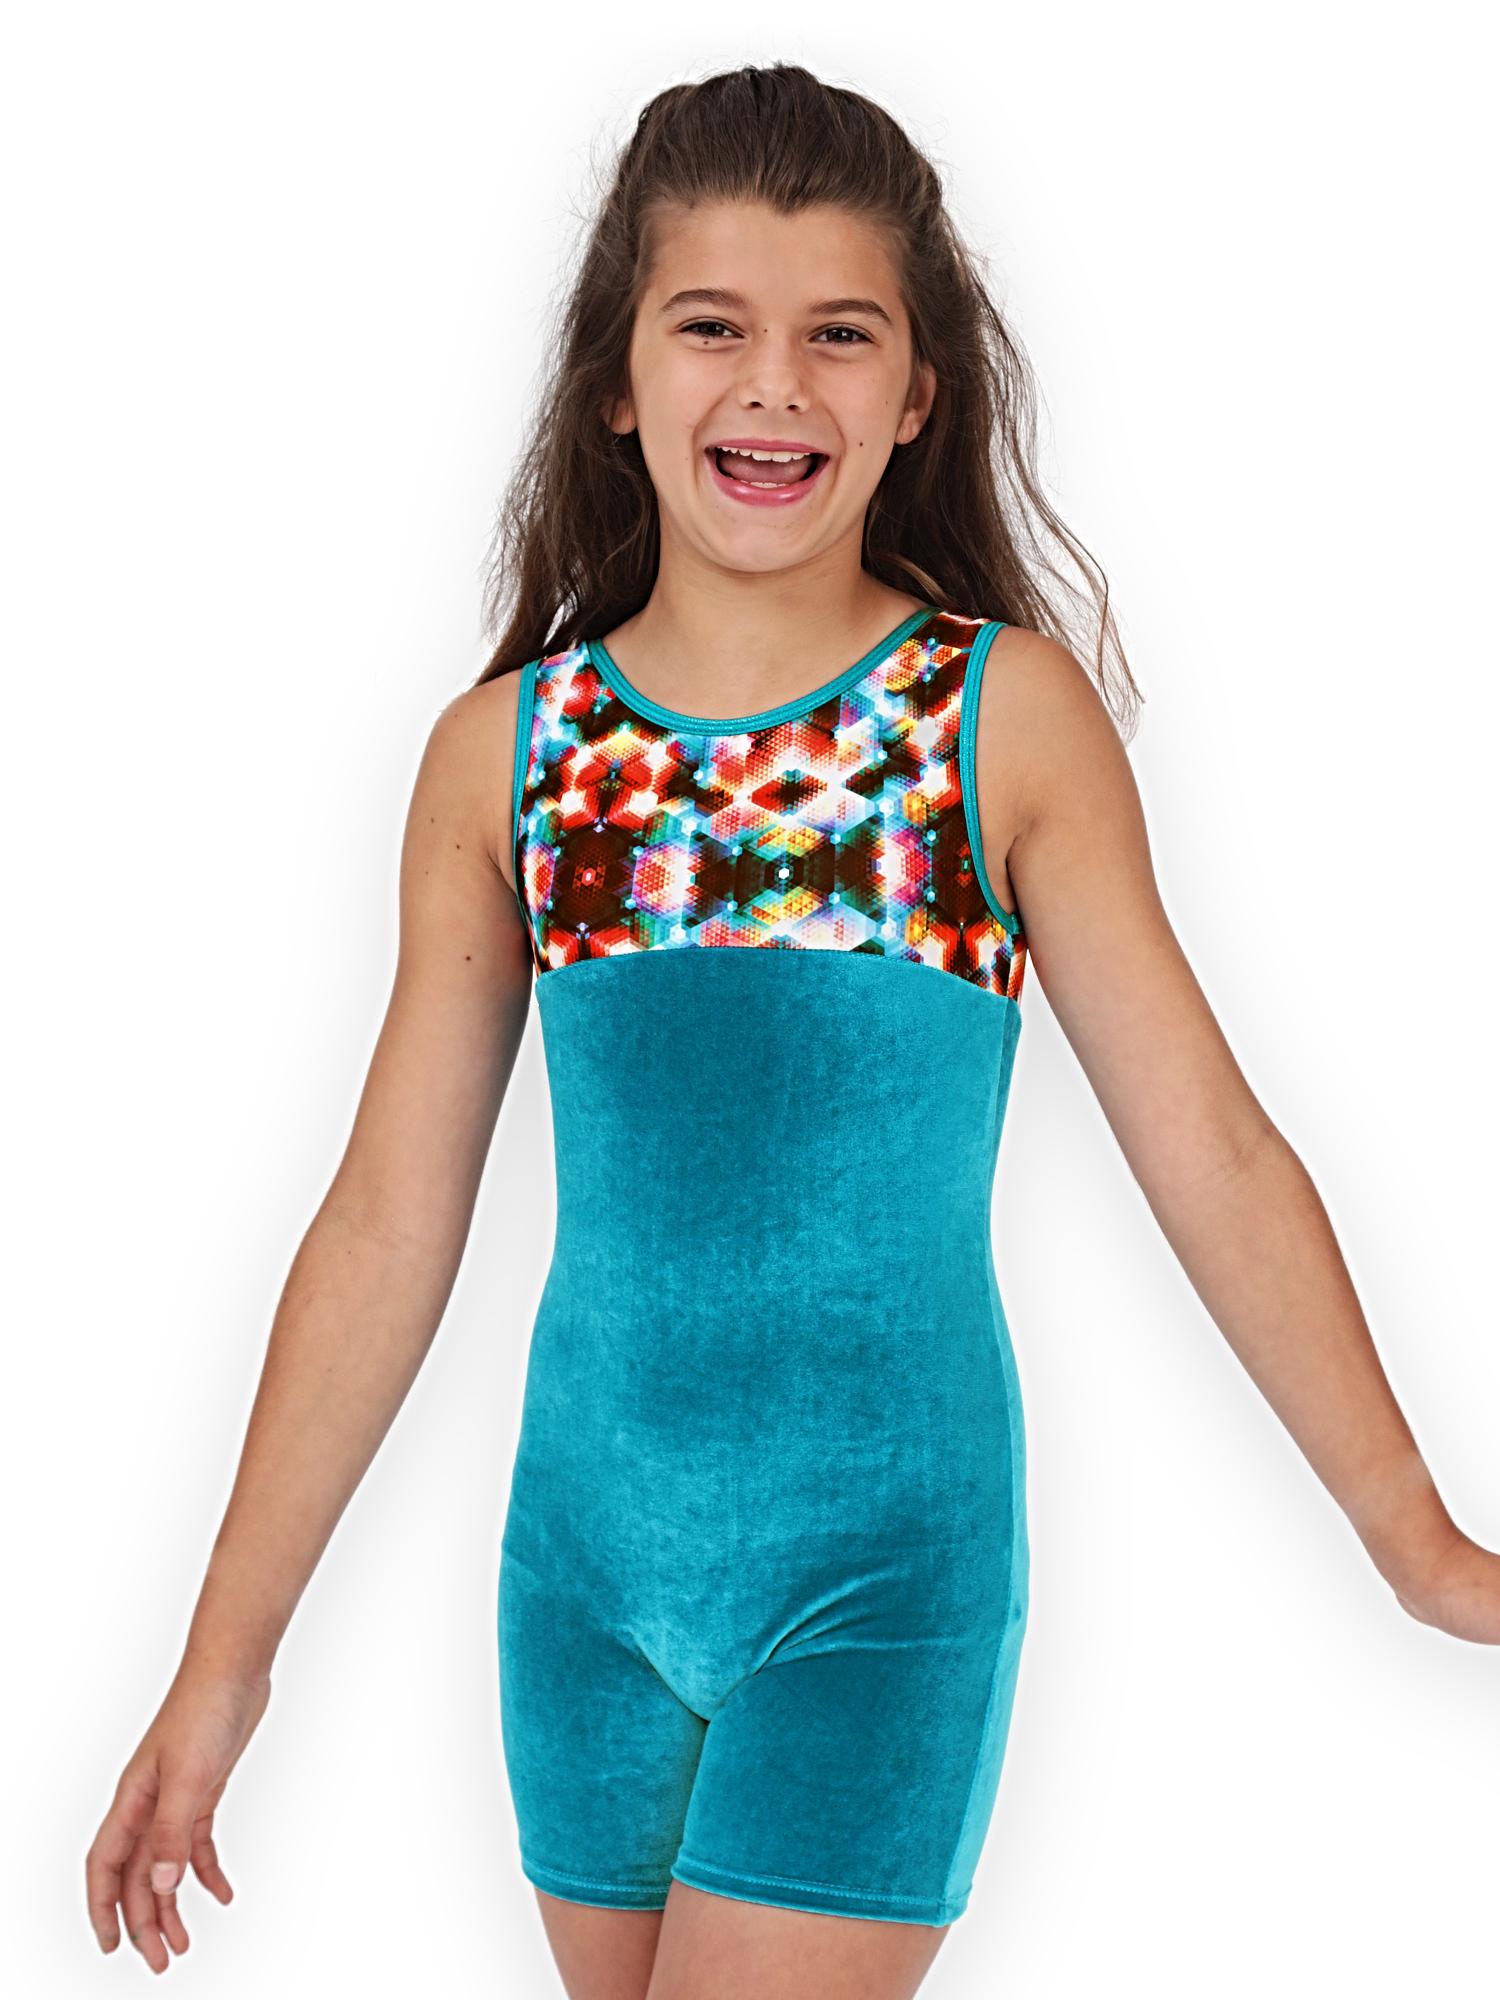 Gymnastics Biketard for Girls - Geo Kaleidoscope Velvet - Leap Gear by Pelle - 6 | Child Medium